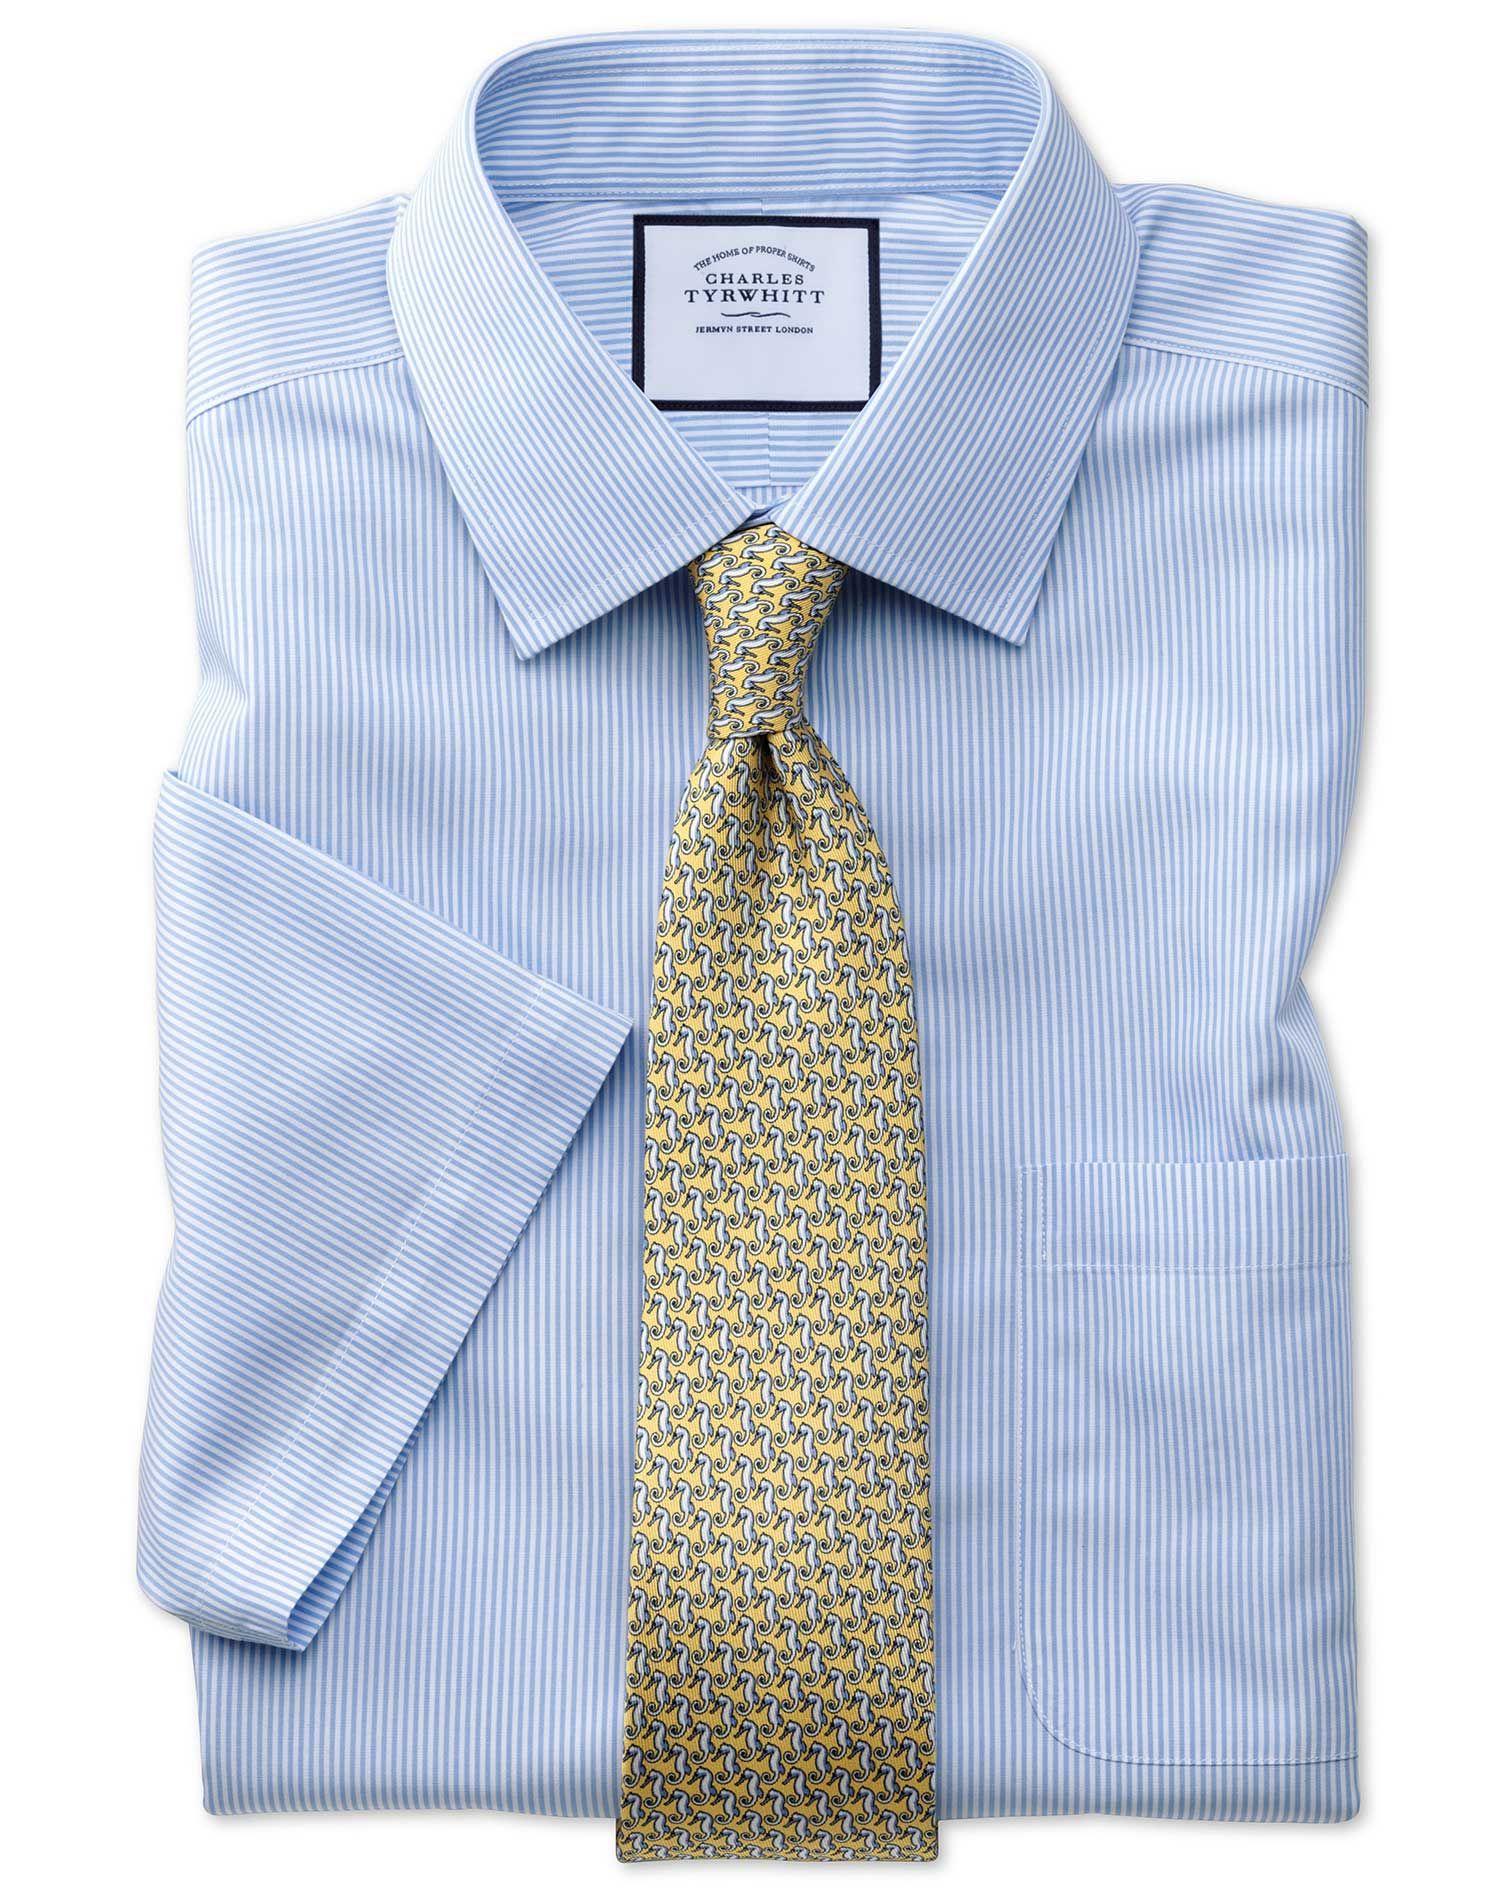 Classic Fit Non-Iron Sky Blue Bengal Stripe Short Sleeve Cotton Dress Shirt Size 16/Short by Charles Tyrwhitt #shortsleevedressshirts